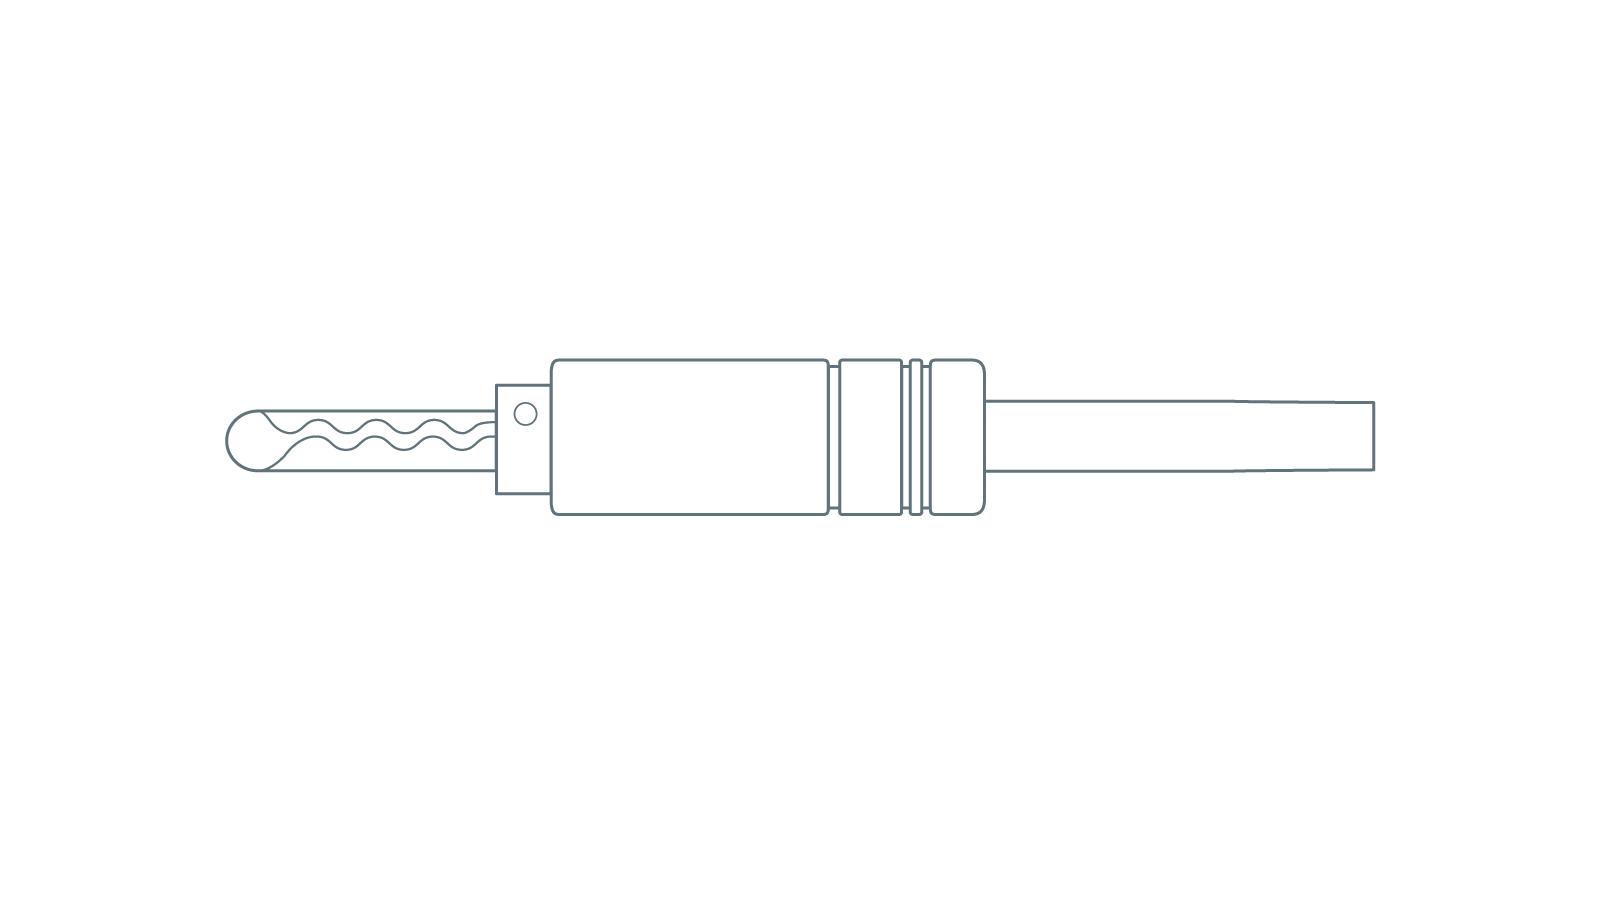 Hyper Bi Wire Speaker Cables Atlas Wiring Diagrams For Kob Tin Cobalt Finished Metal Z Plug